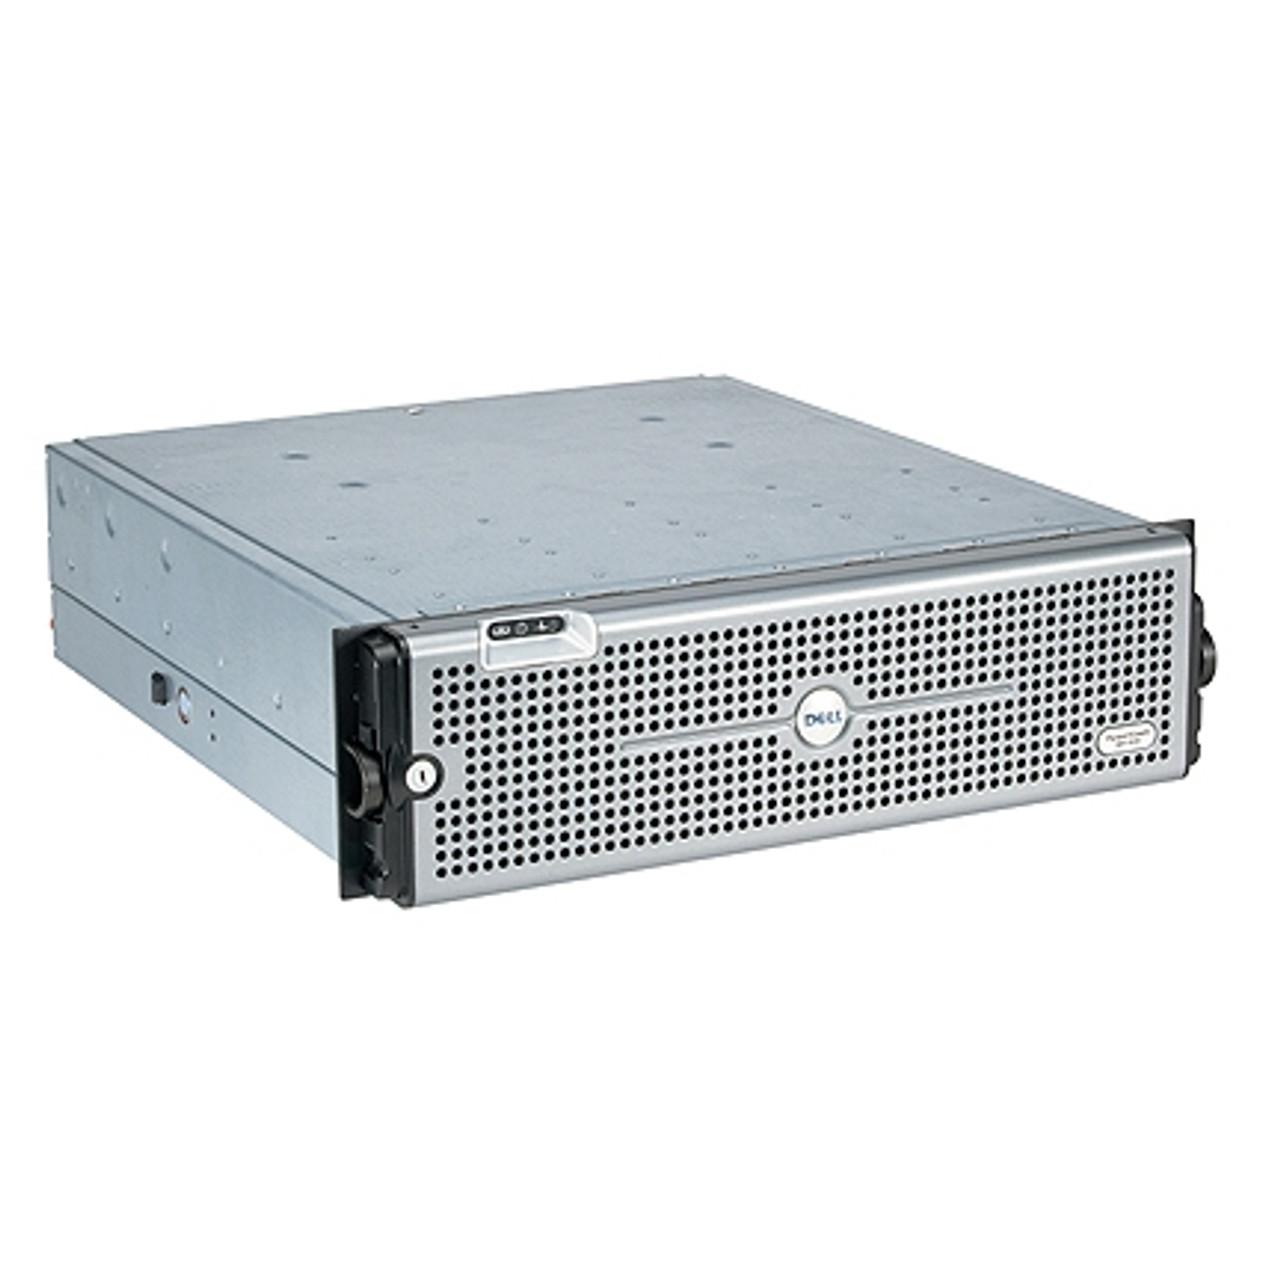 Dell PowerVault MD1000 Storage Arrays